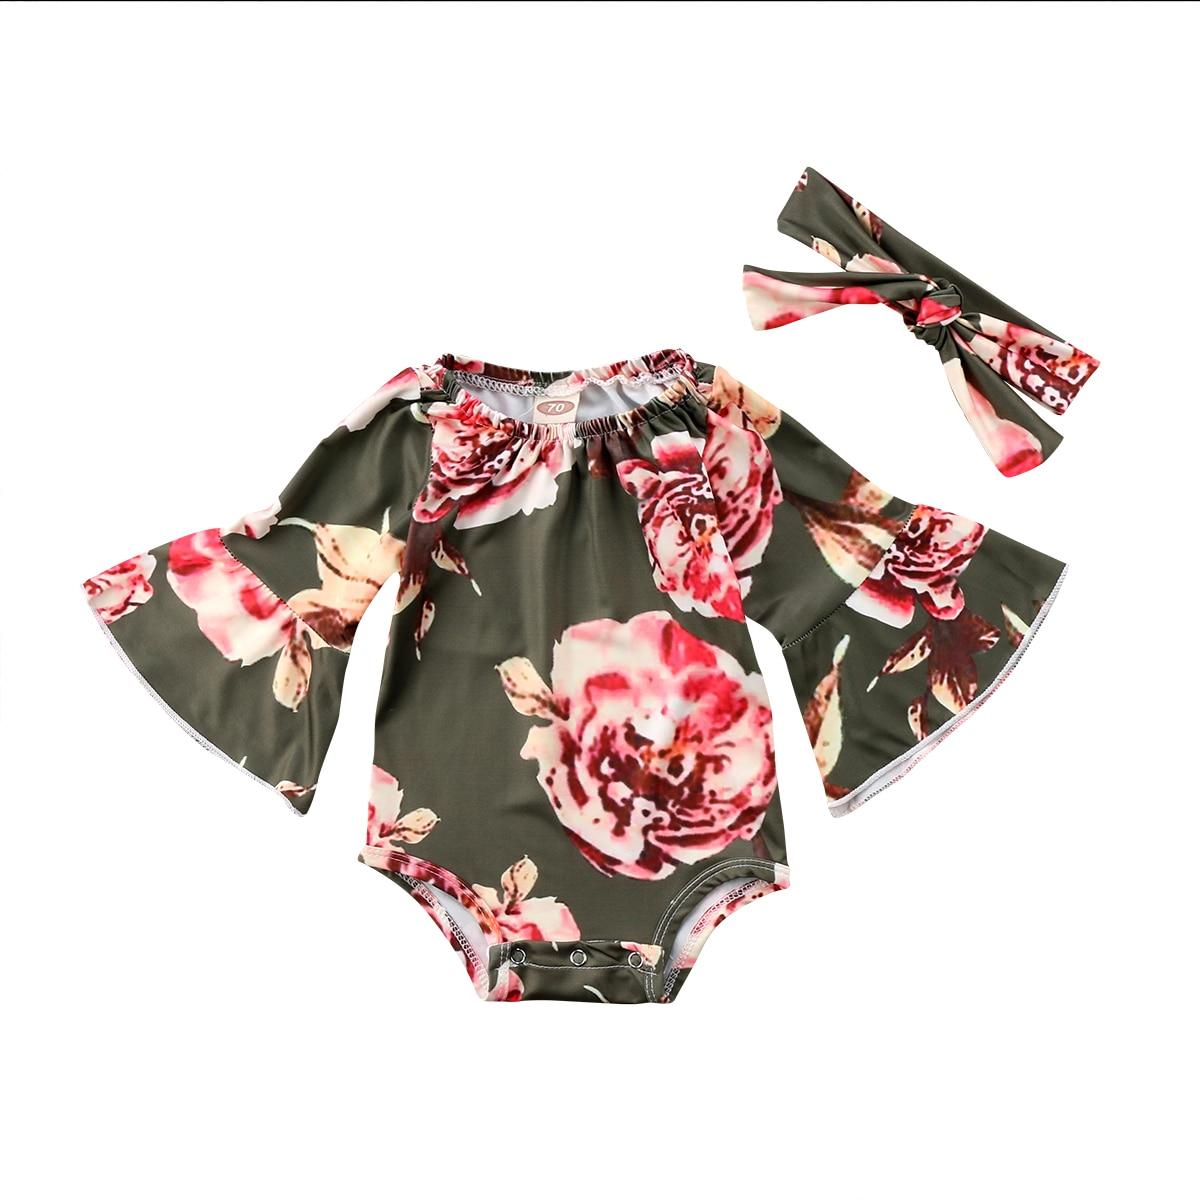 2018 Newborn Infant Baby Girls Clothes Floral Romper Flower